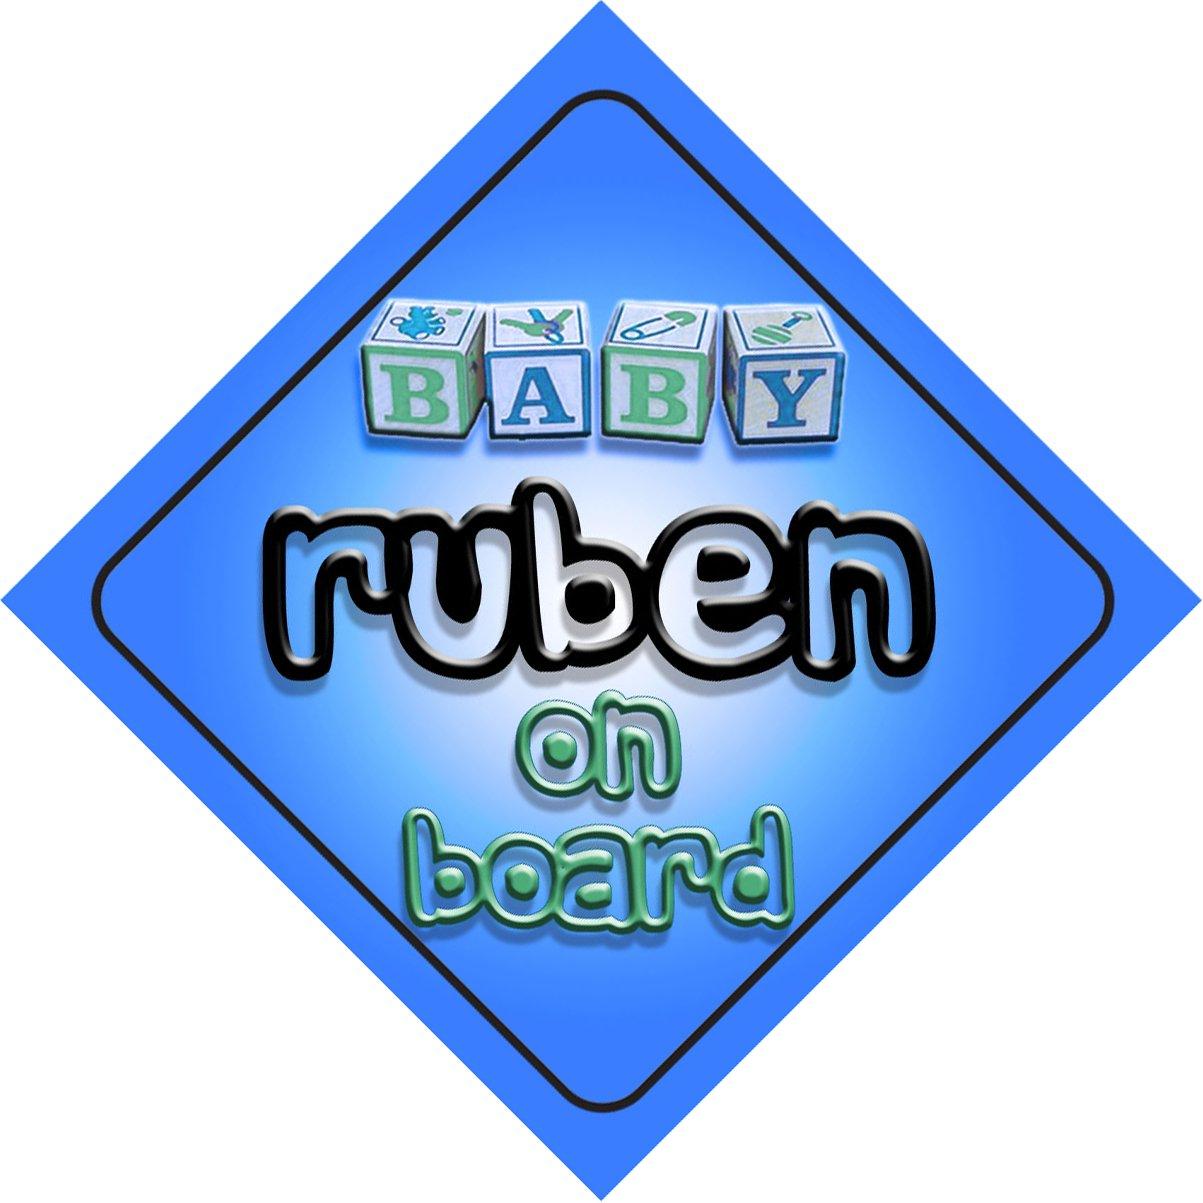 Baby Boy Ruben on board novelty car sign gift / present for new child / newborn baby Quality Goods Ltd